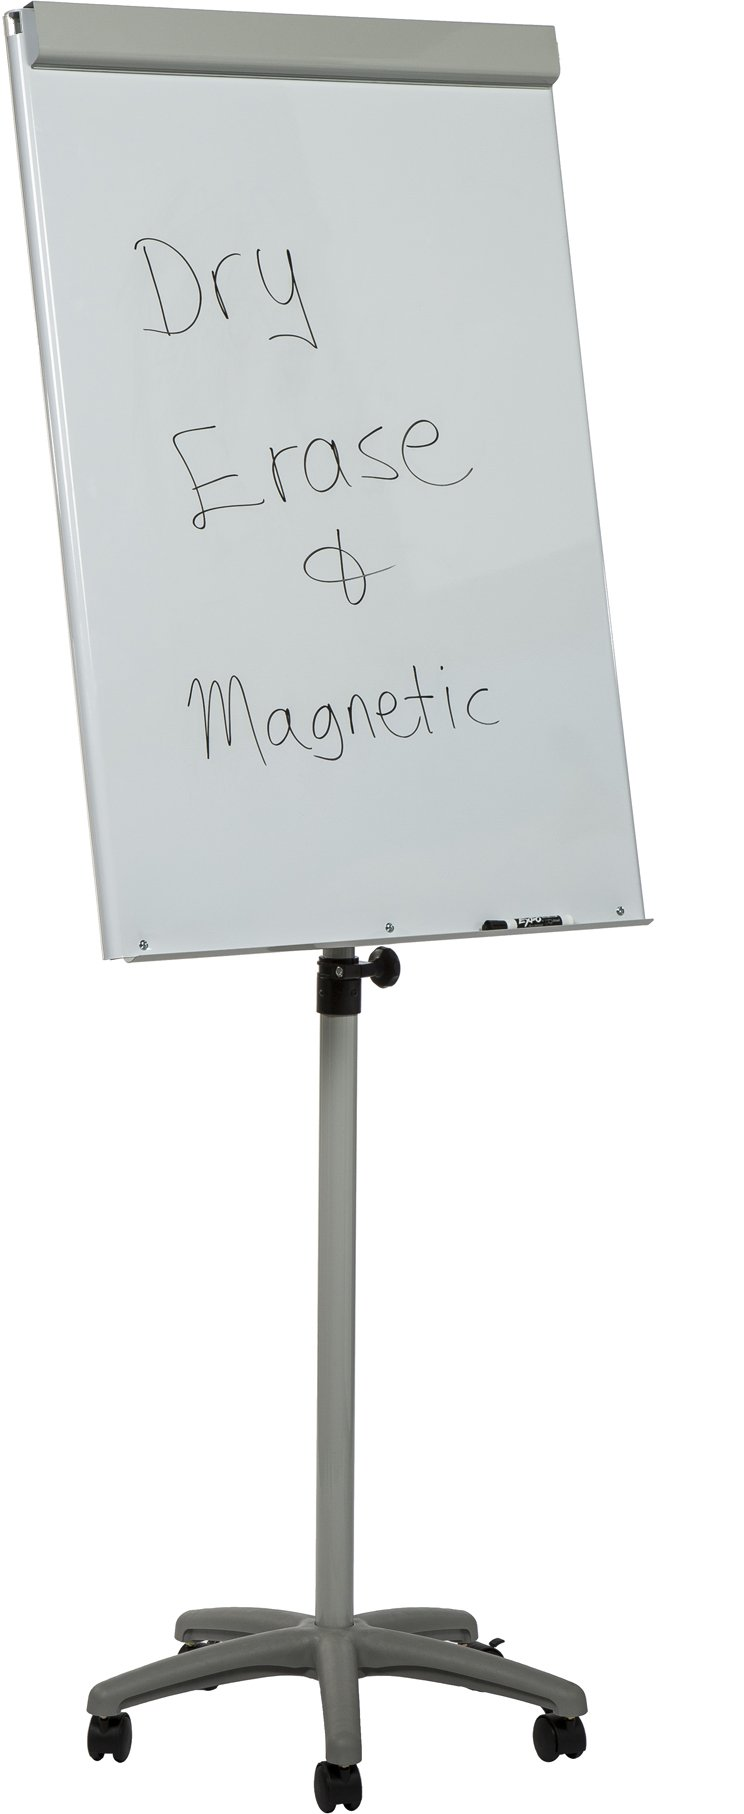 Heavy-Duty Mobile Magnetic Dry-Erase Flipchart Easel - 29'' x 42'' board